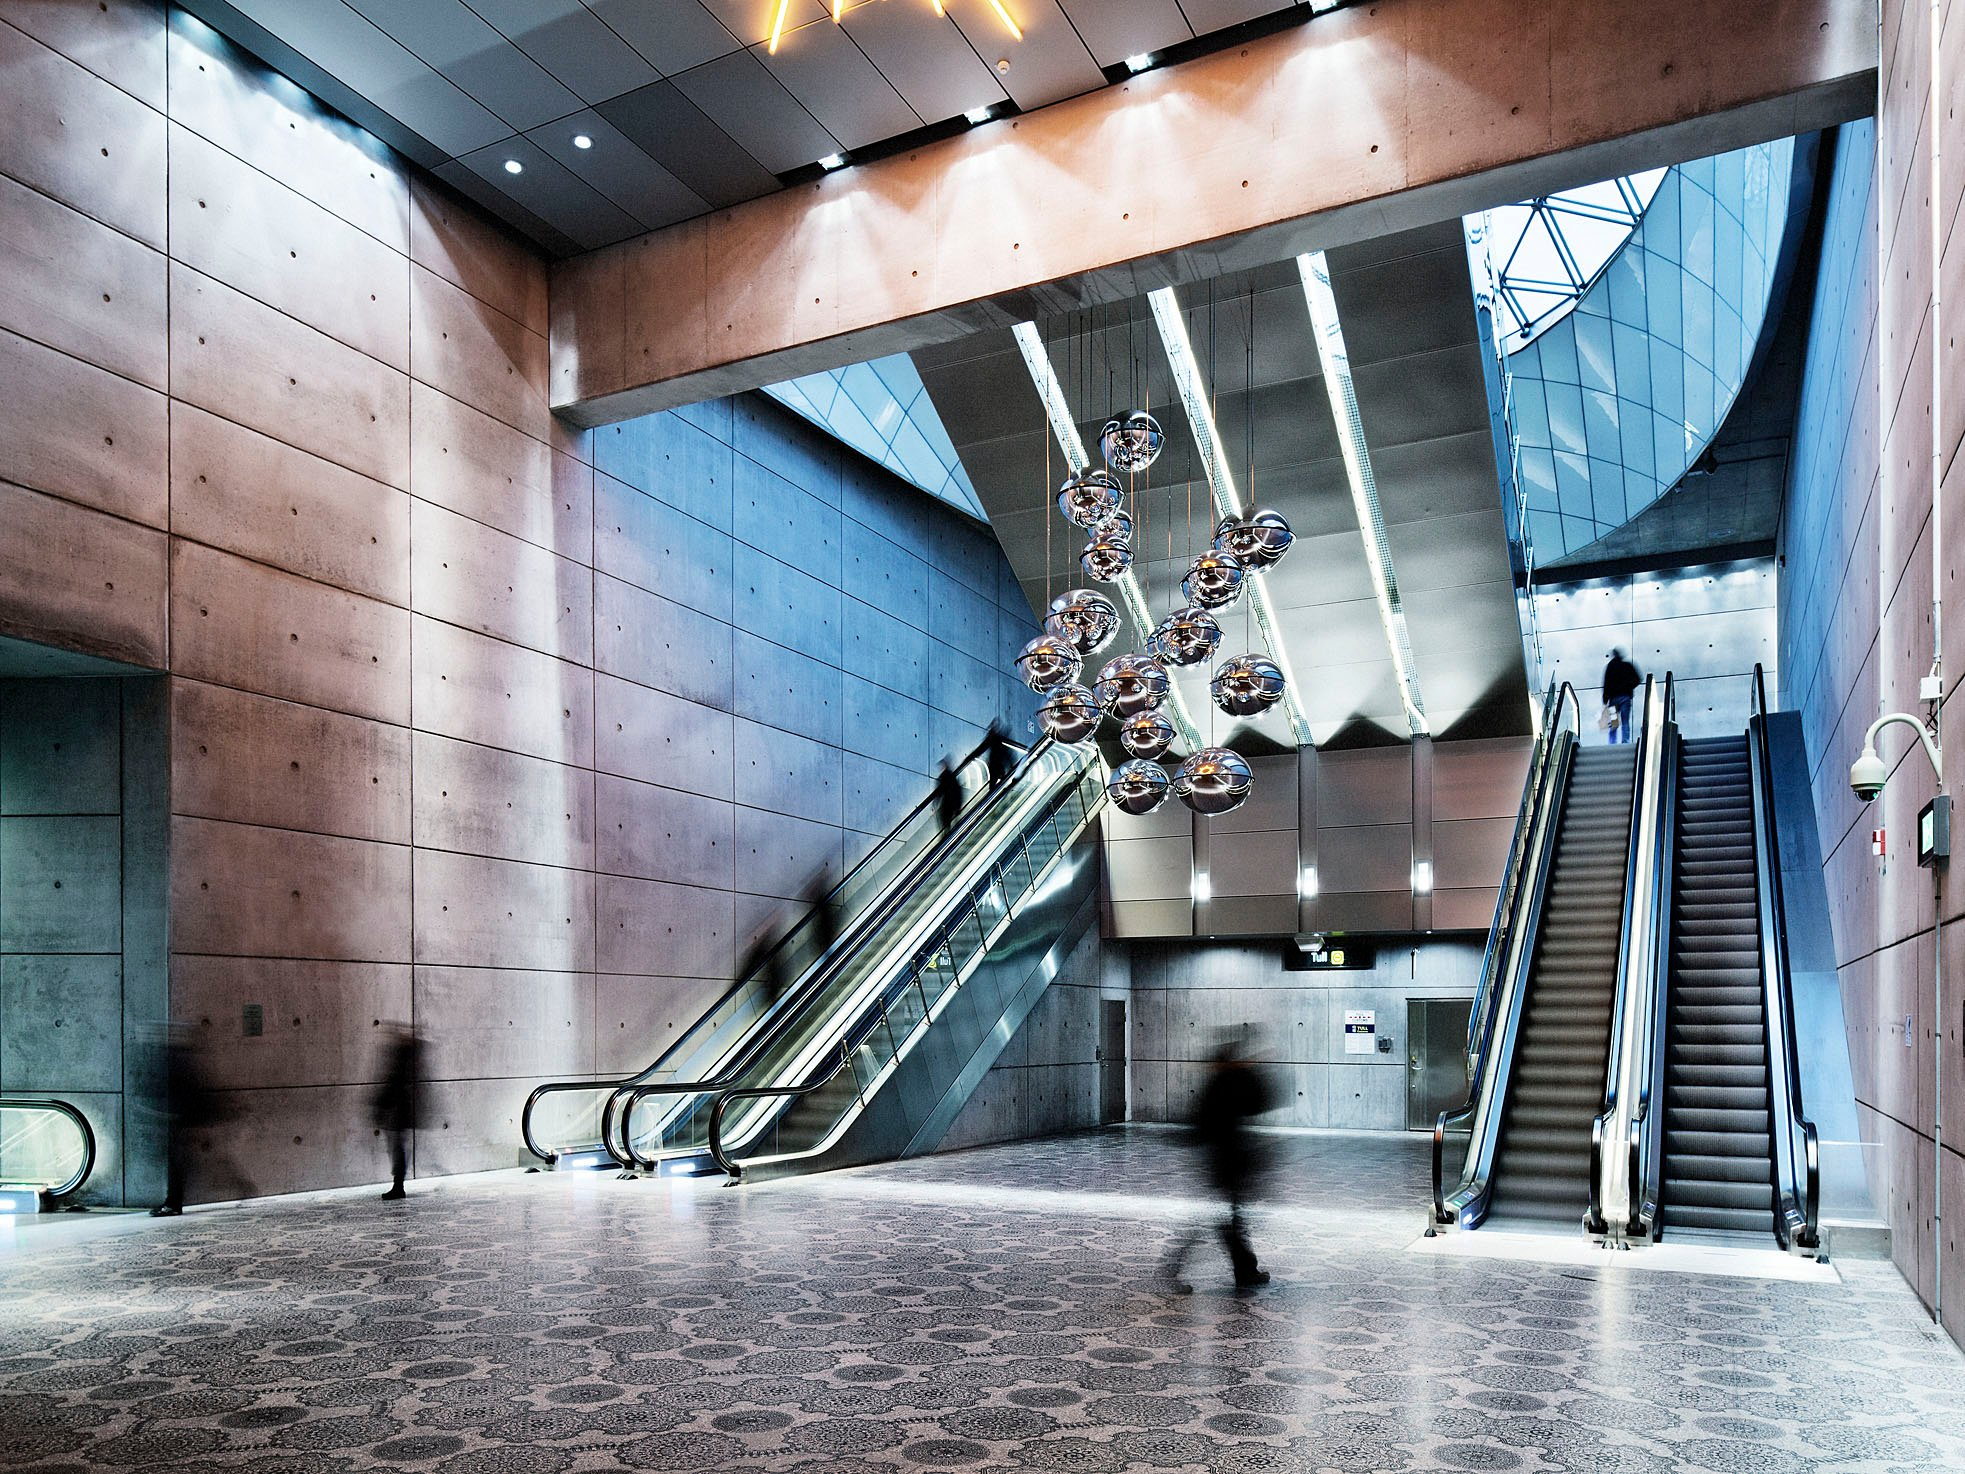 citytunneln_triangeln_felixgimg_15411277